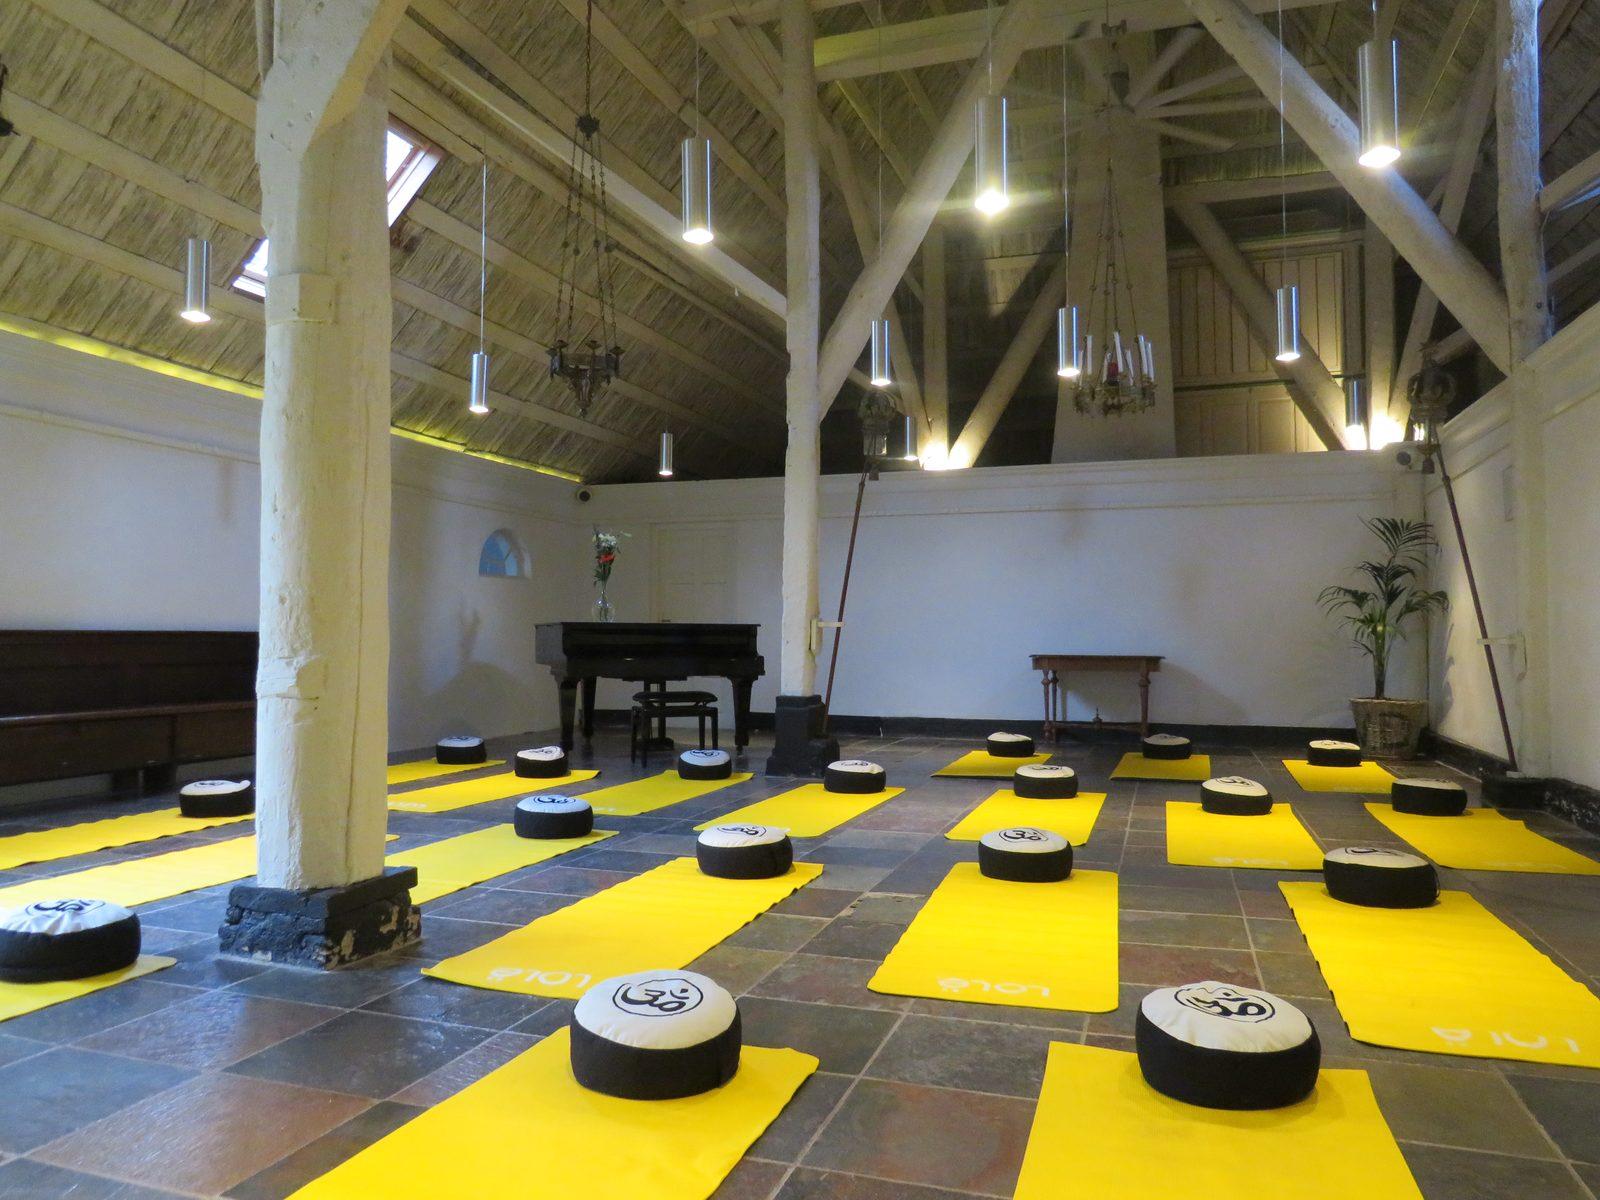 chapel mats yellow